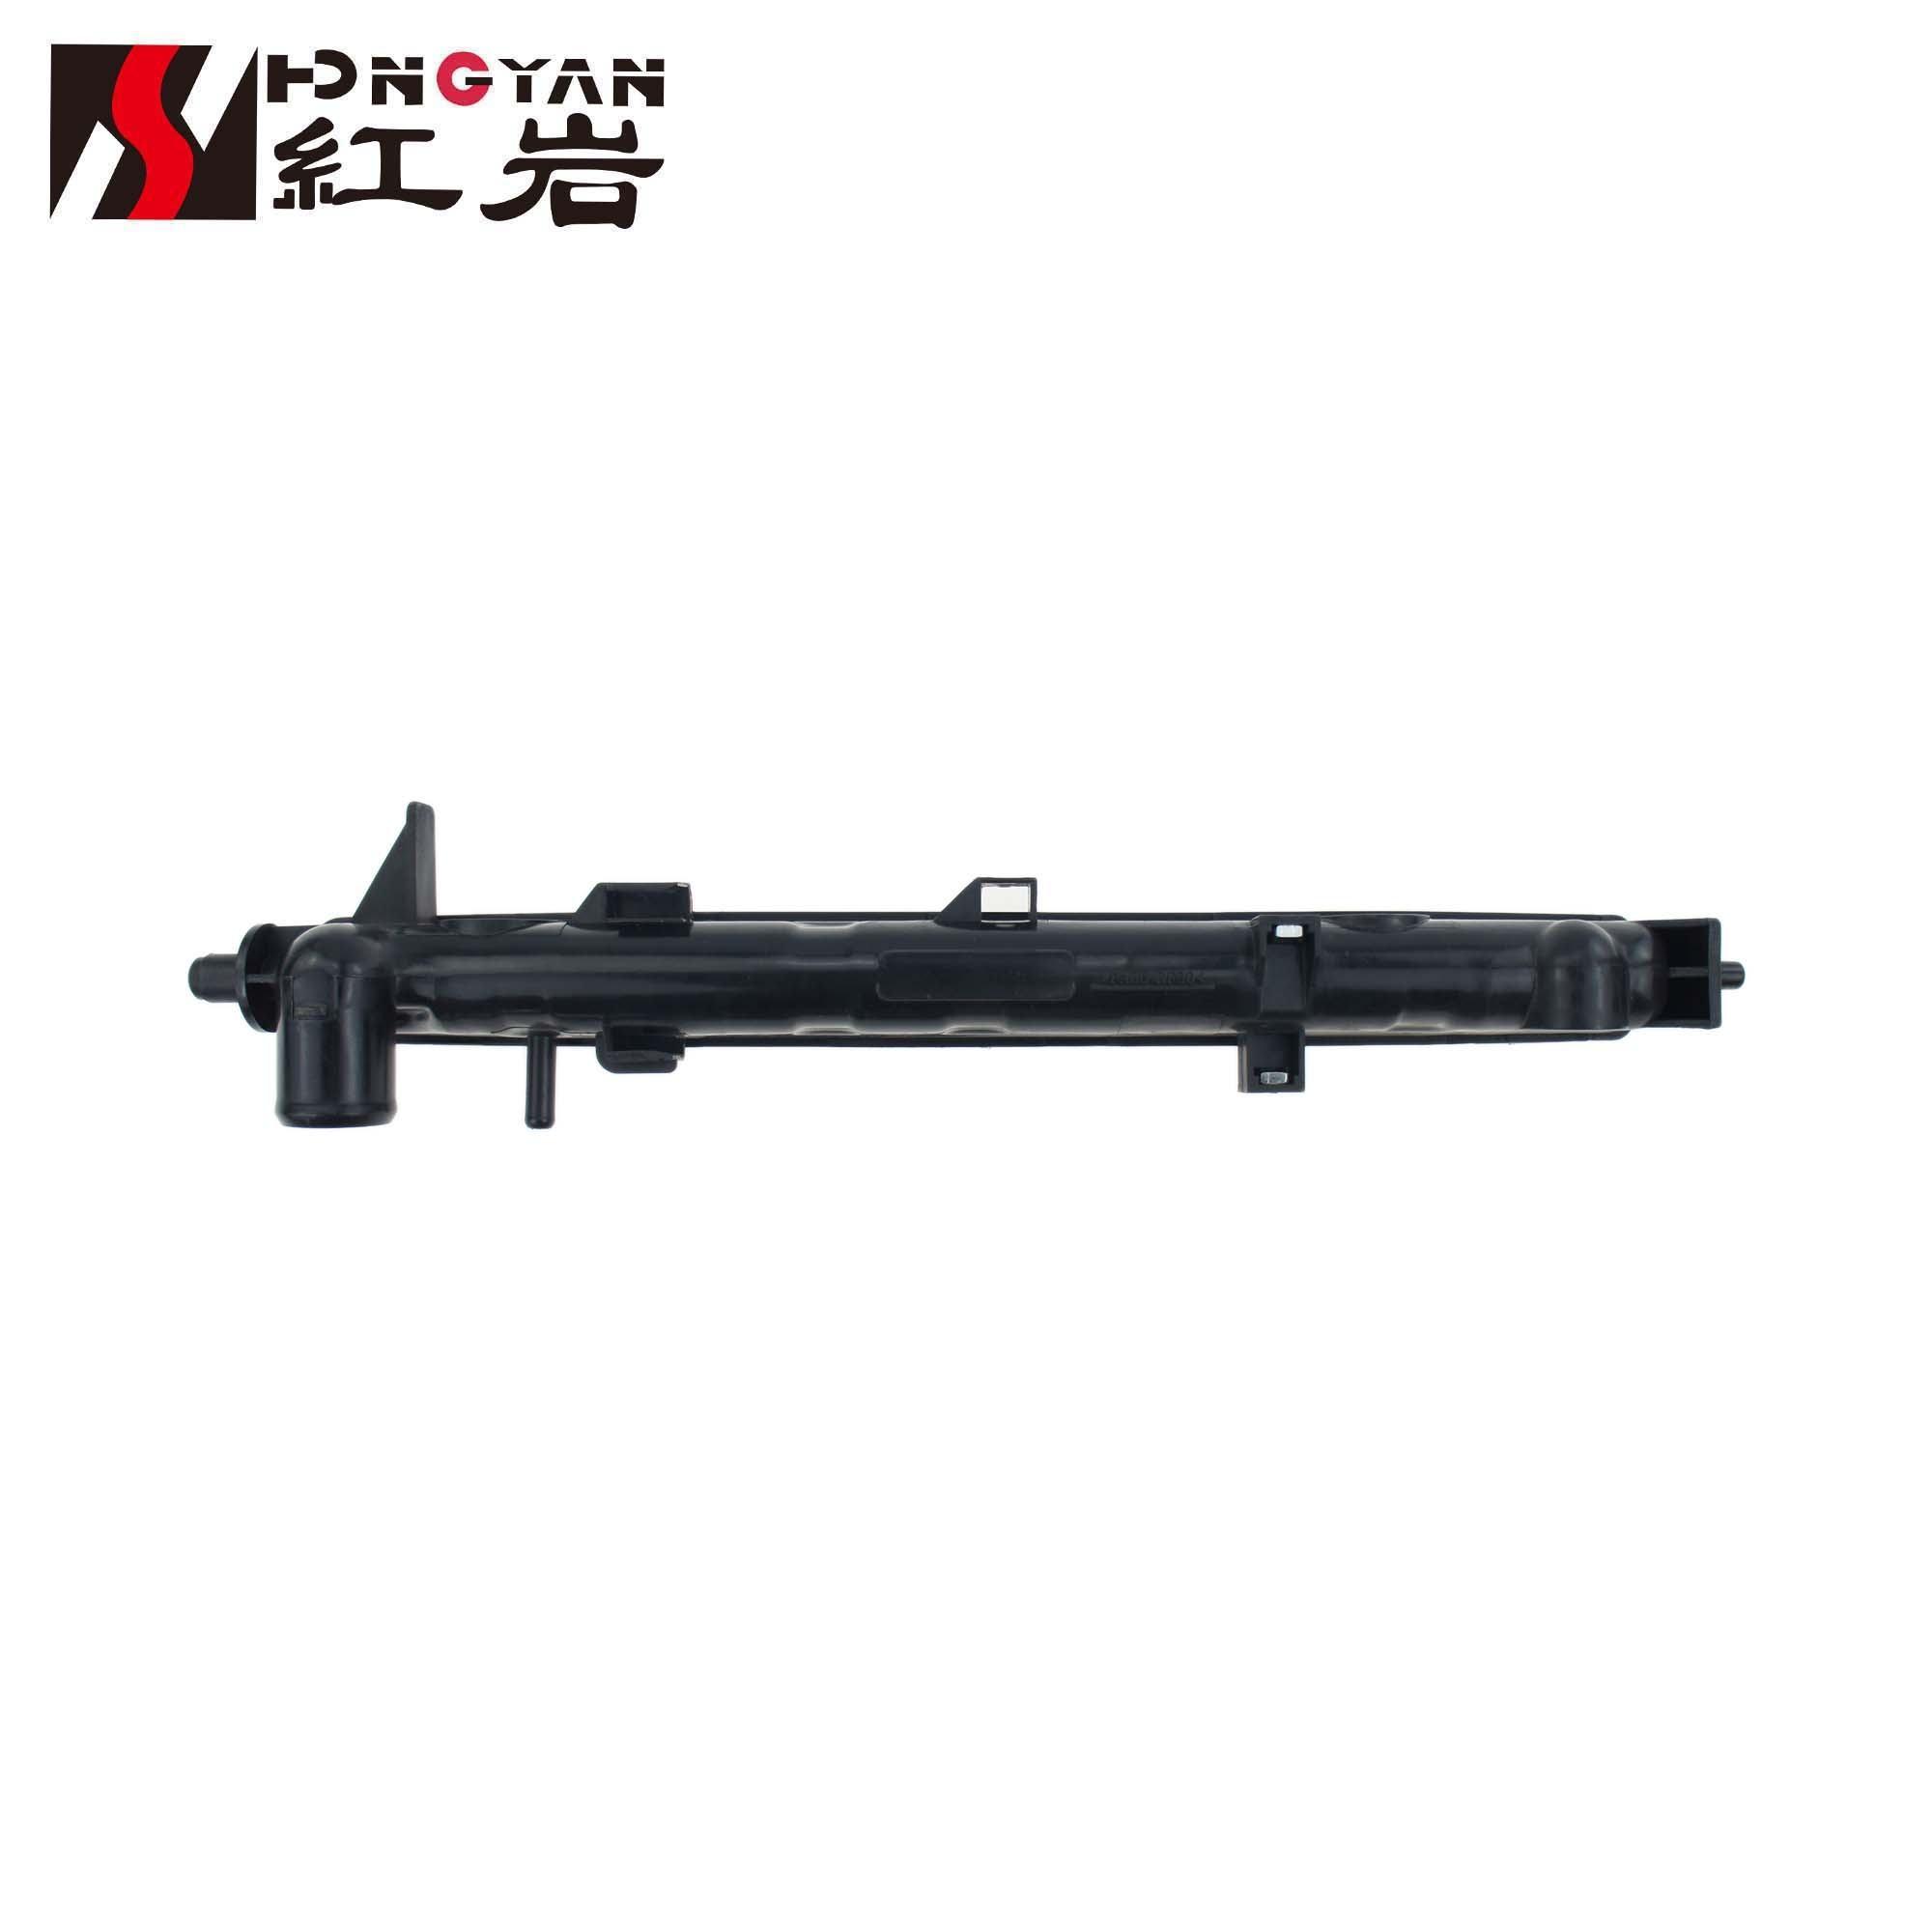 Mazda MPV 3.0L V6  Factory Power Steering Reservoir Dip Stick 1989 To 1998